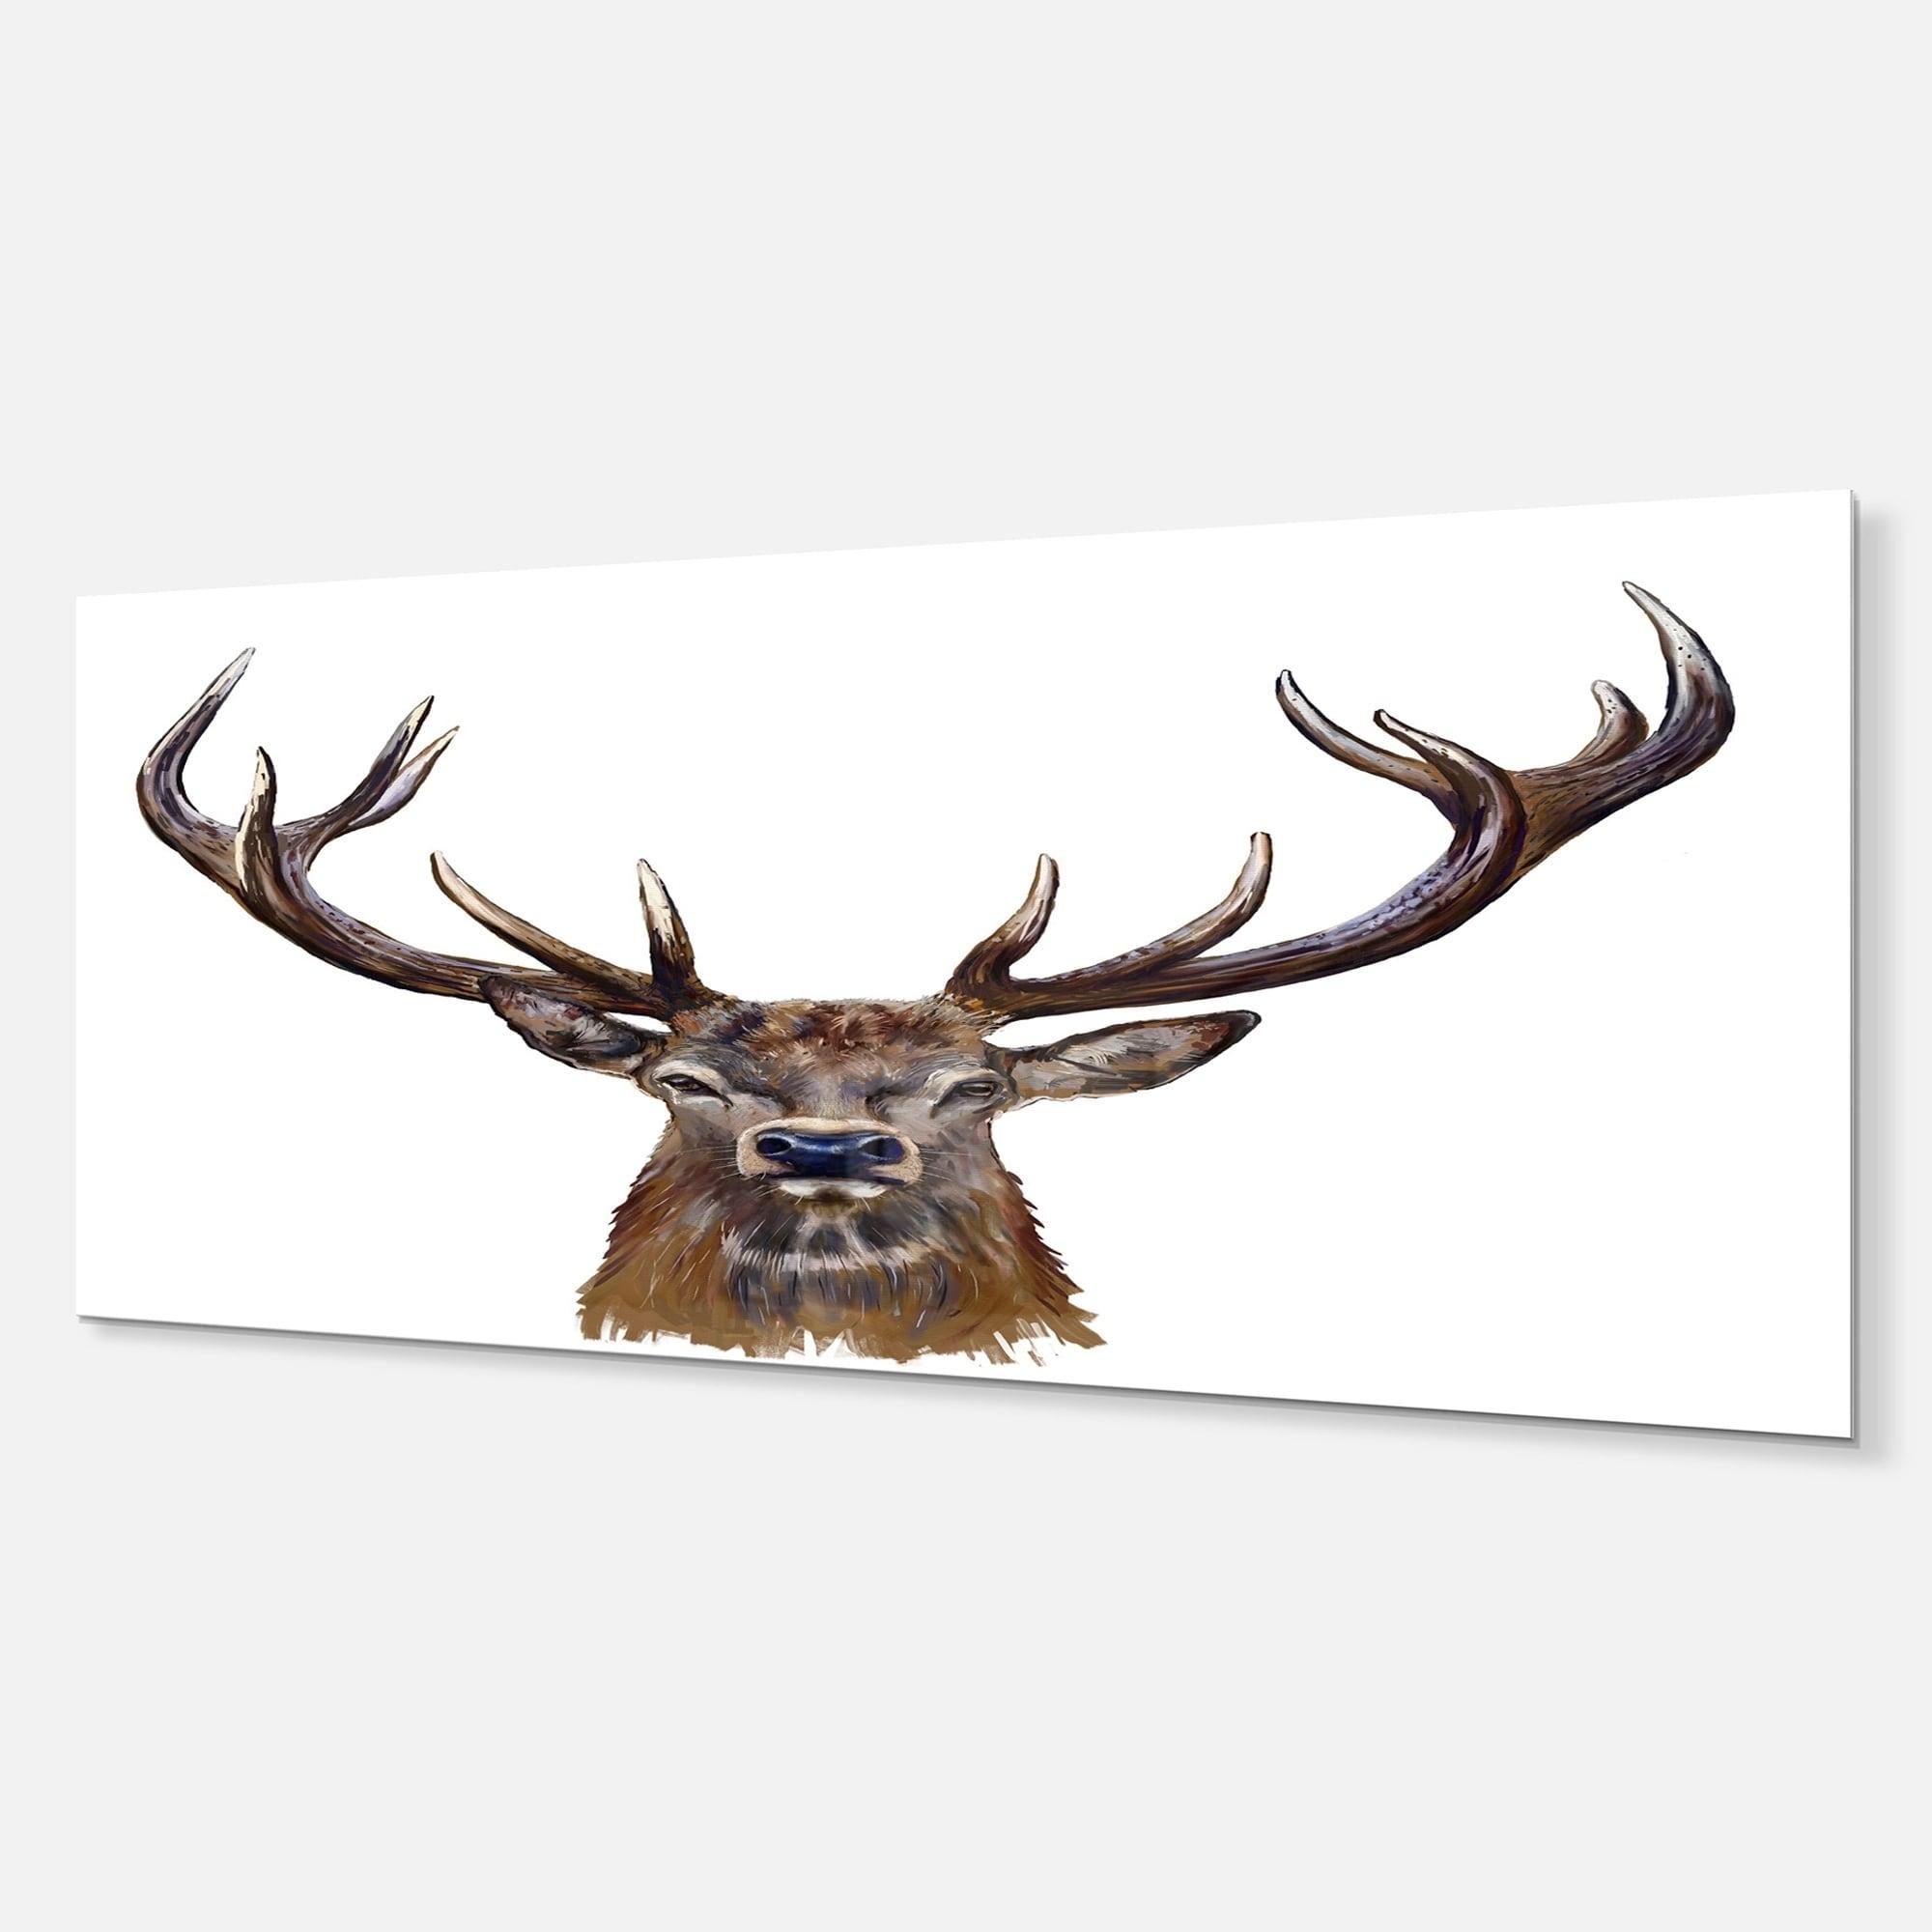 Designart Deer Head In Front Illustration Animal Metal Wall Art Overstock 11867160